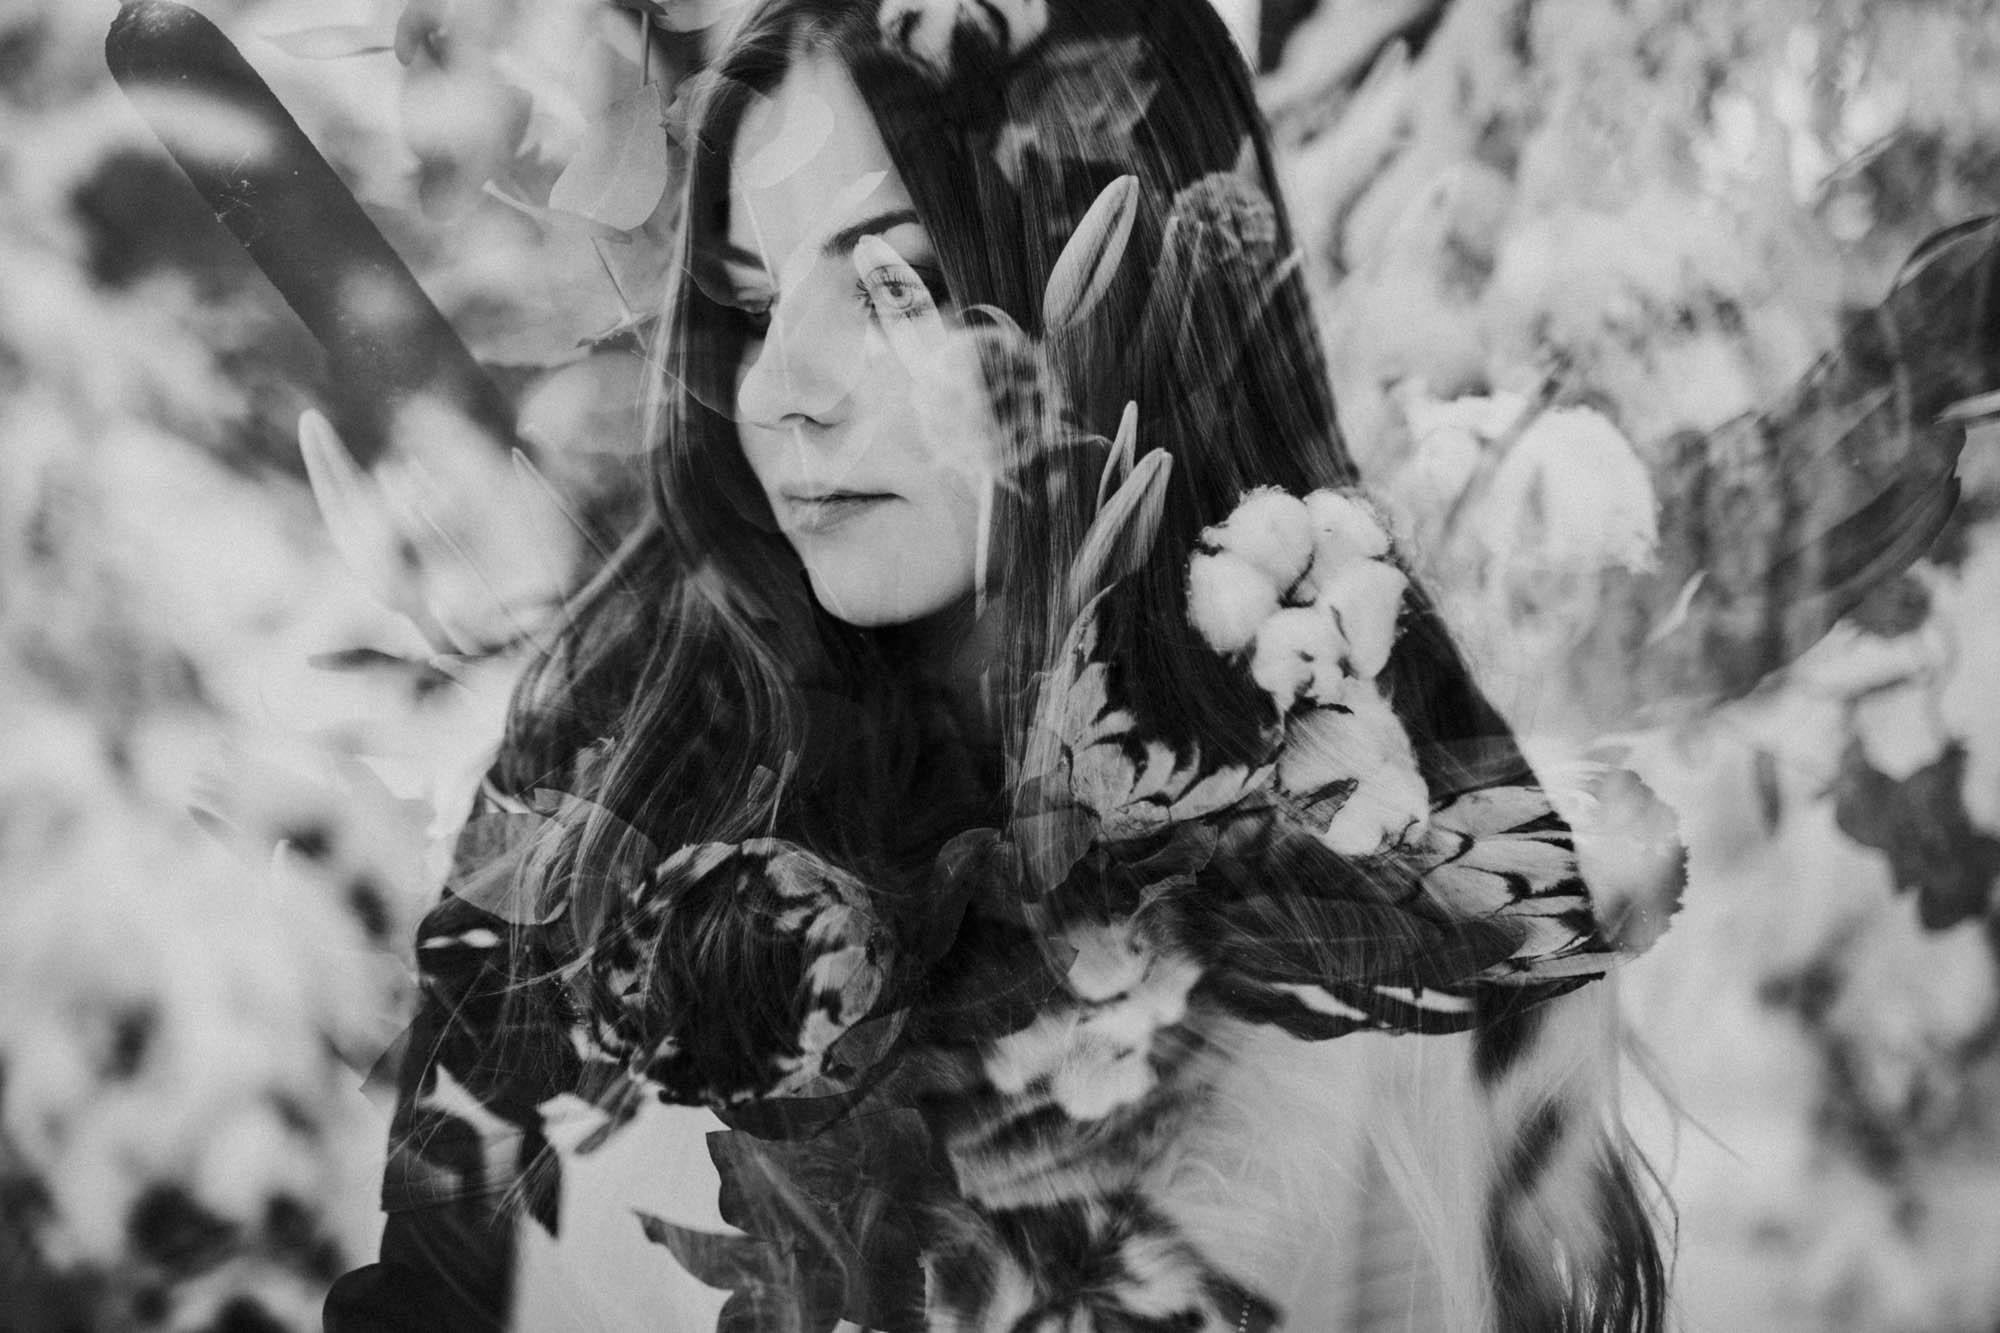 ashley_schulman_photography-winter_wedding_tampere-38.jpg